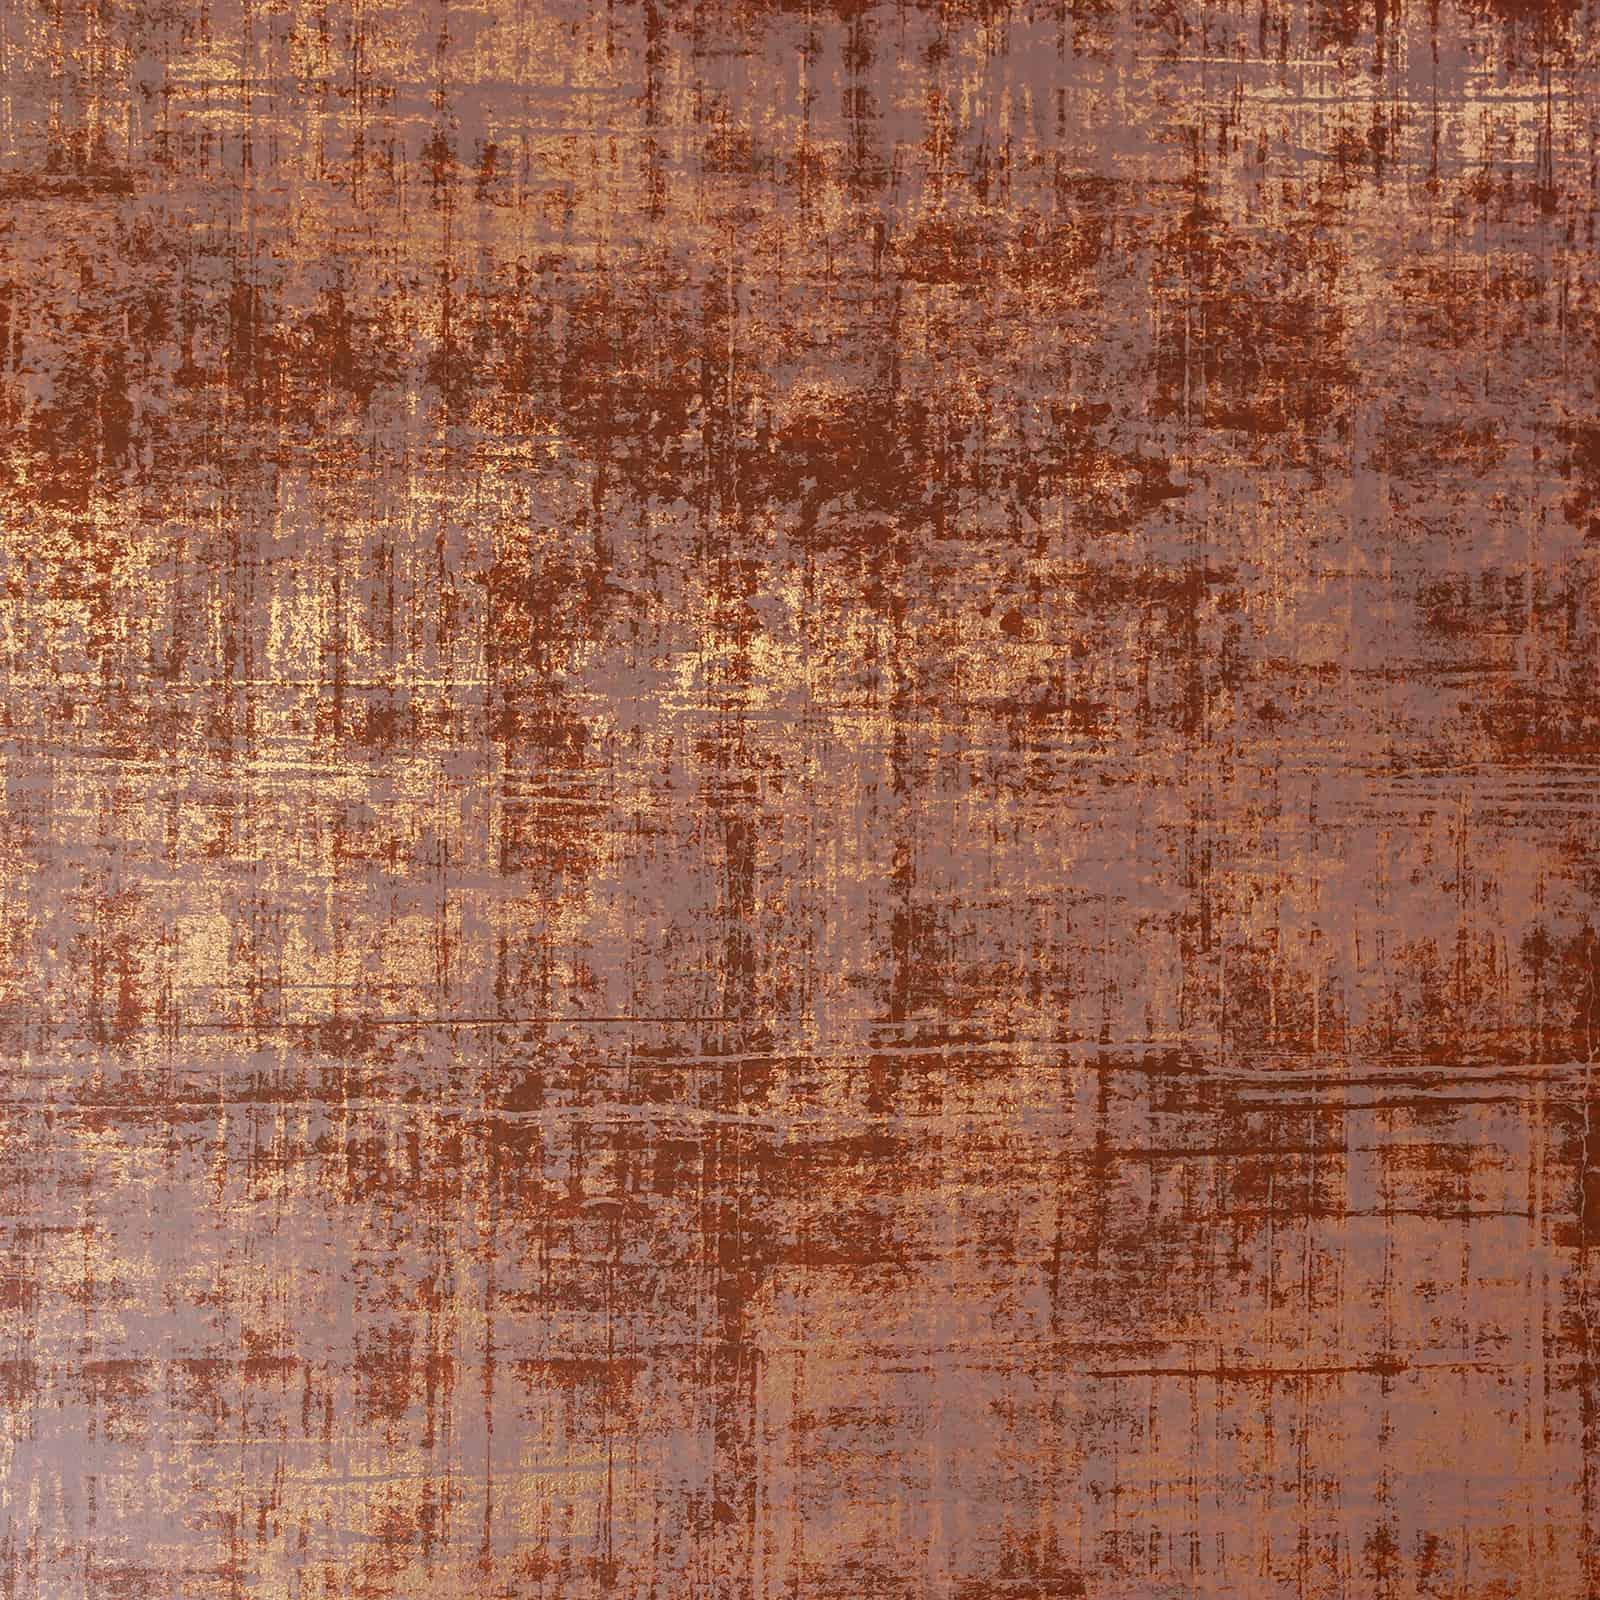 Copper-MYLAR